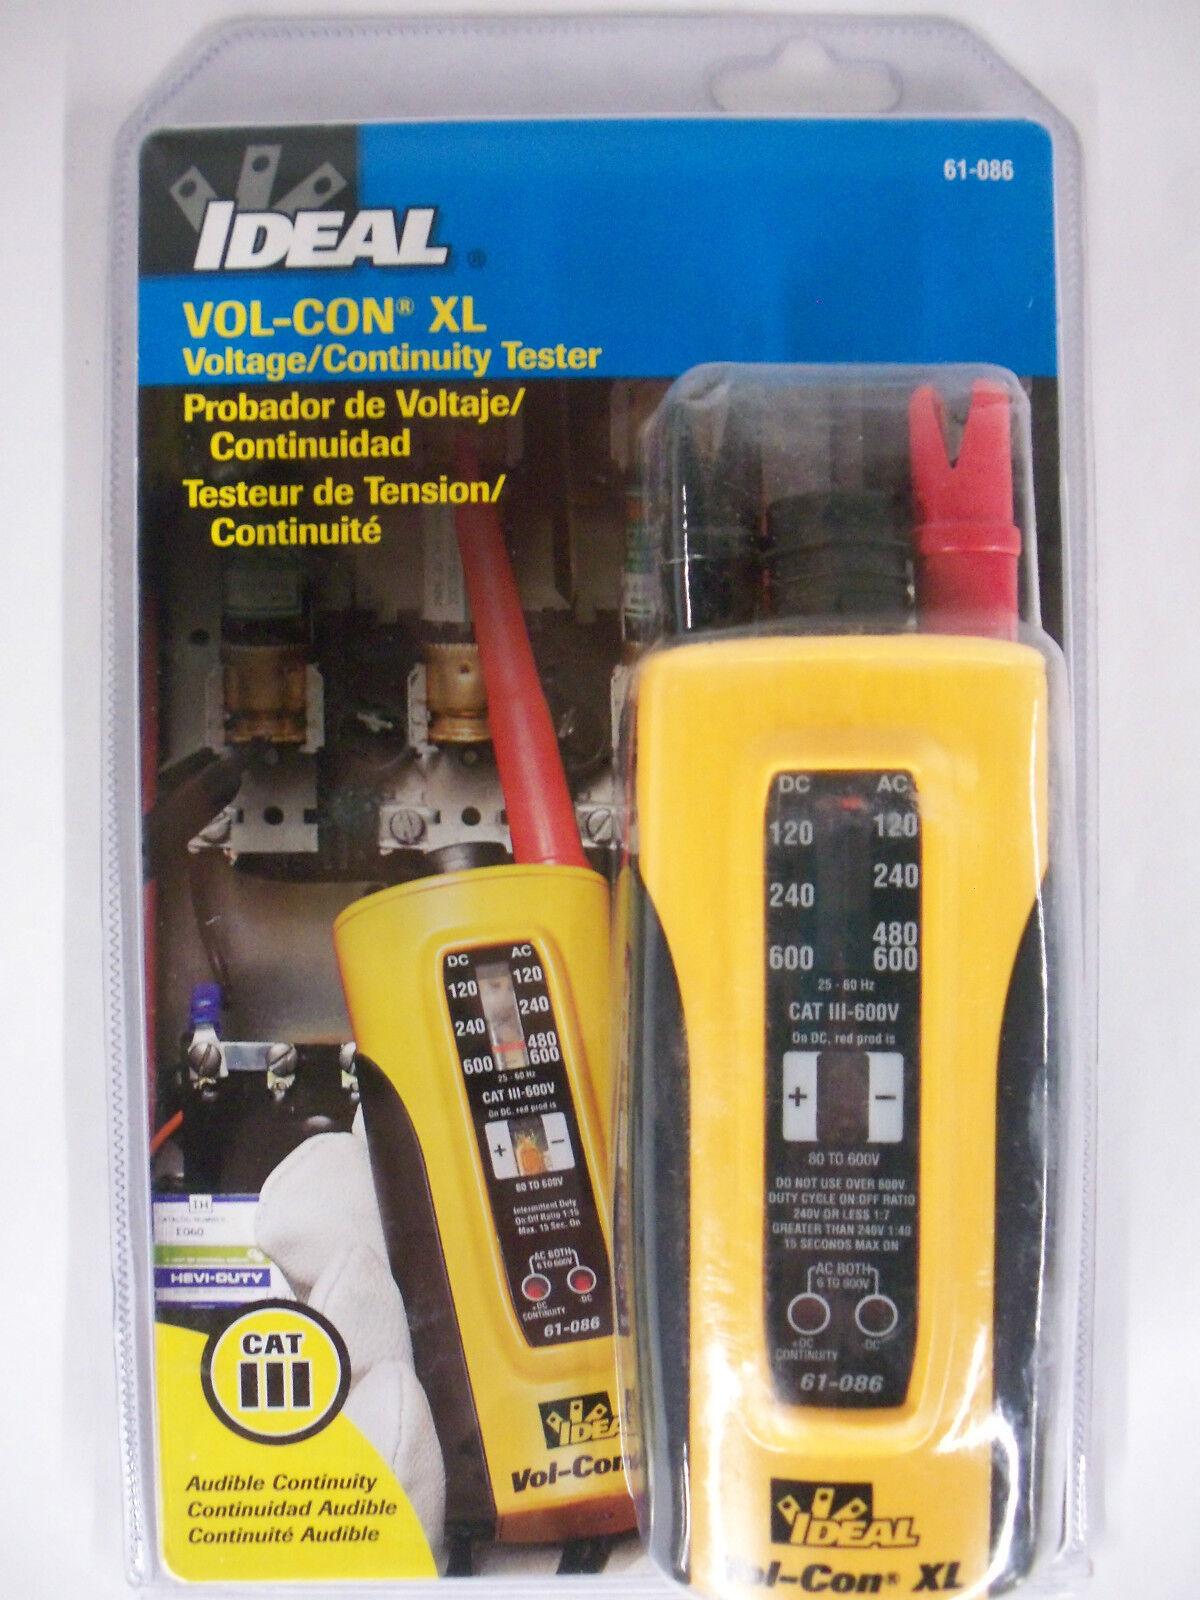 Ideal Vol-con Xl Voltage Meter/continuity/solenoid Tester Wiggy